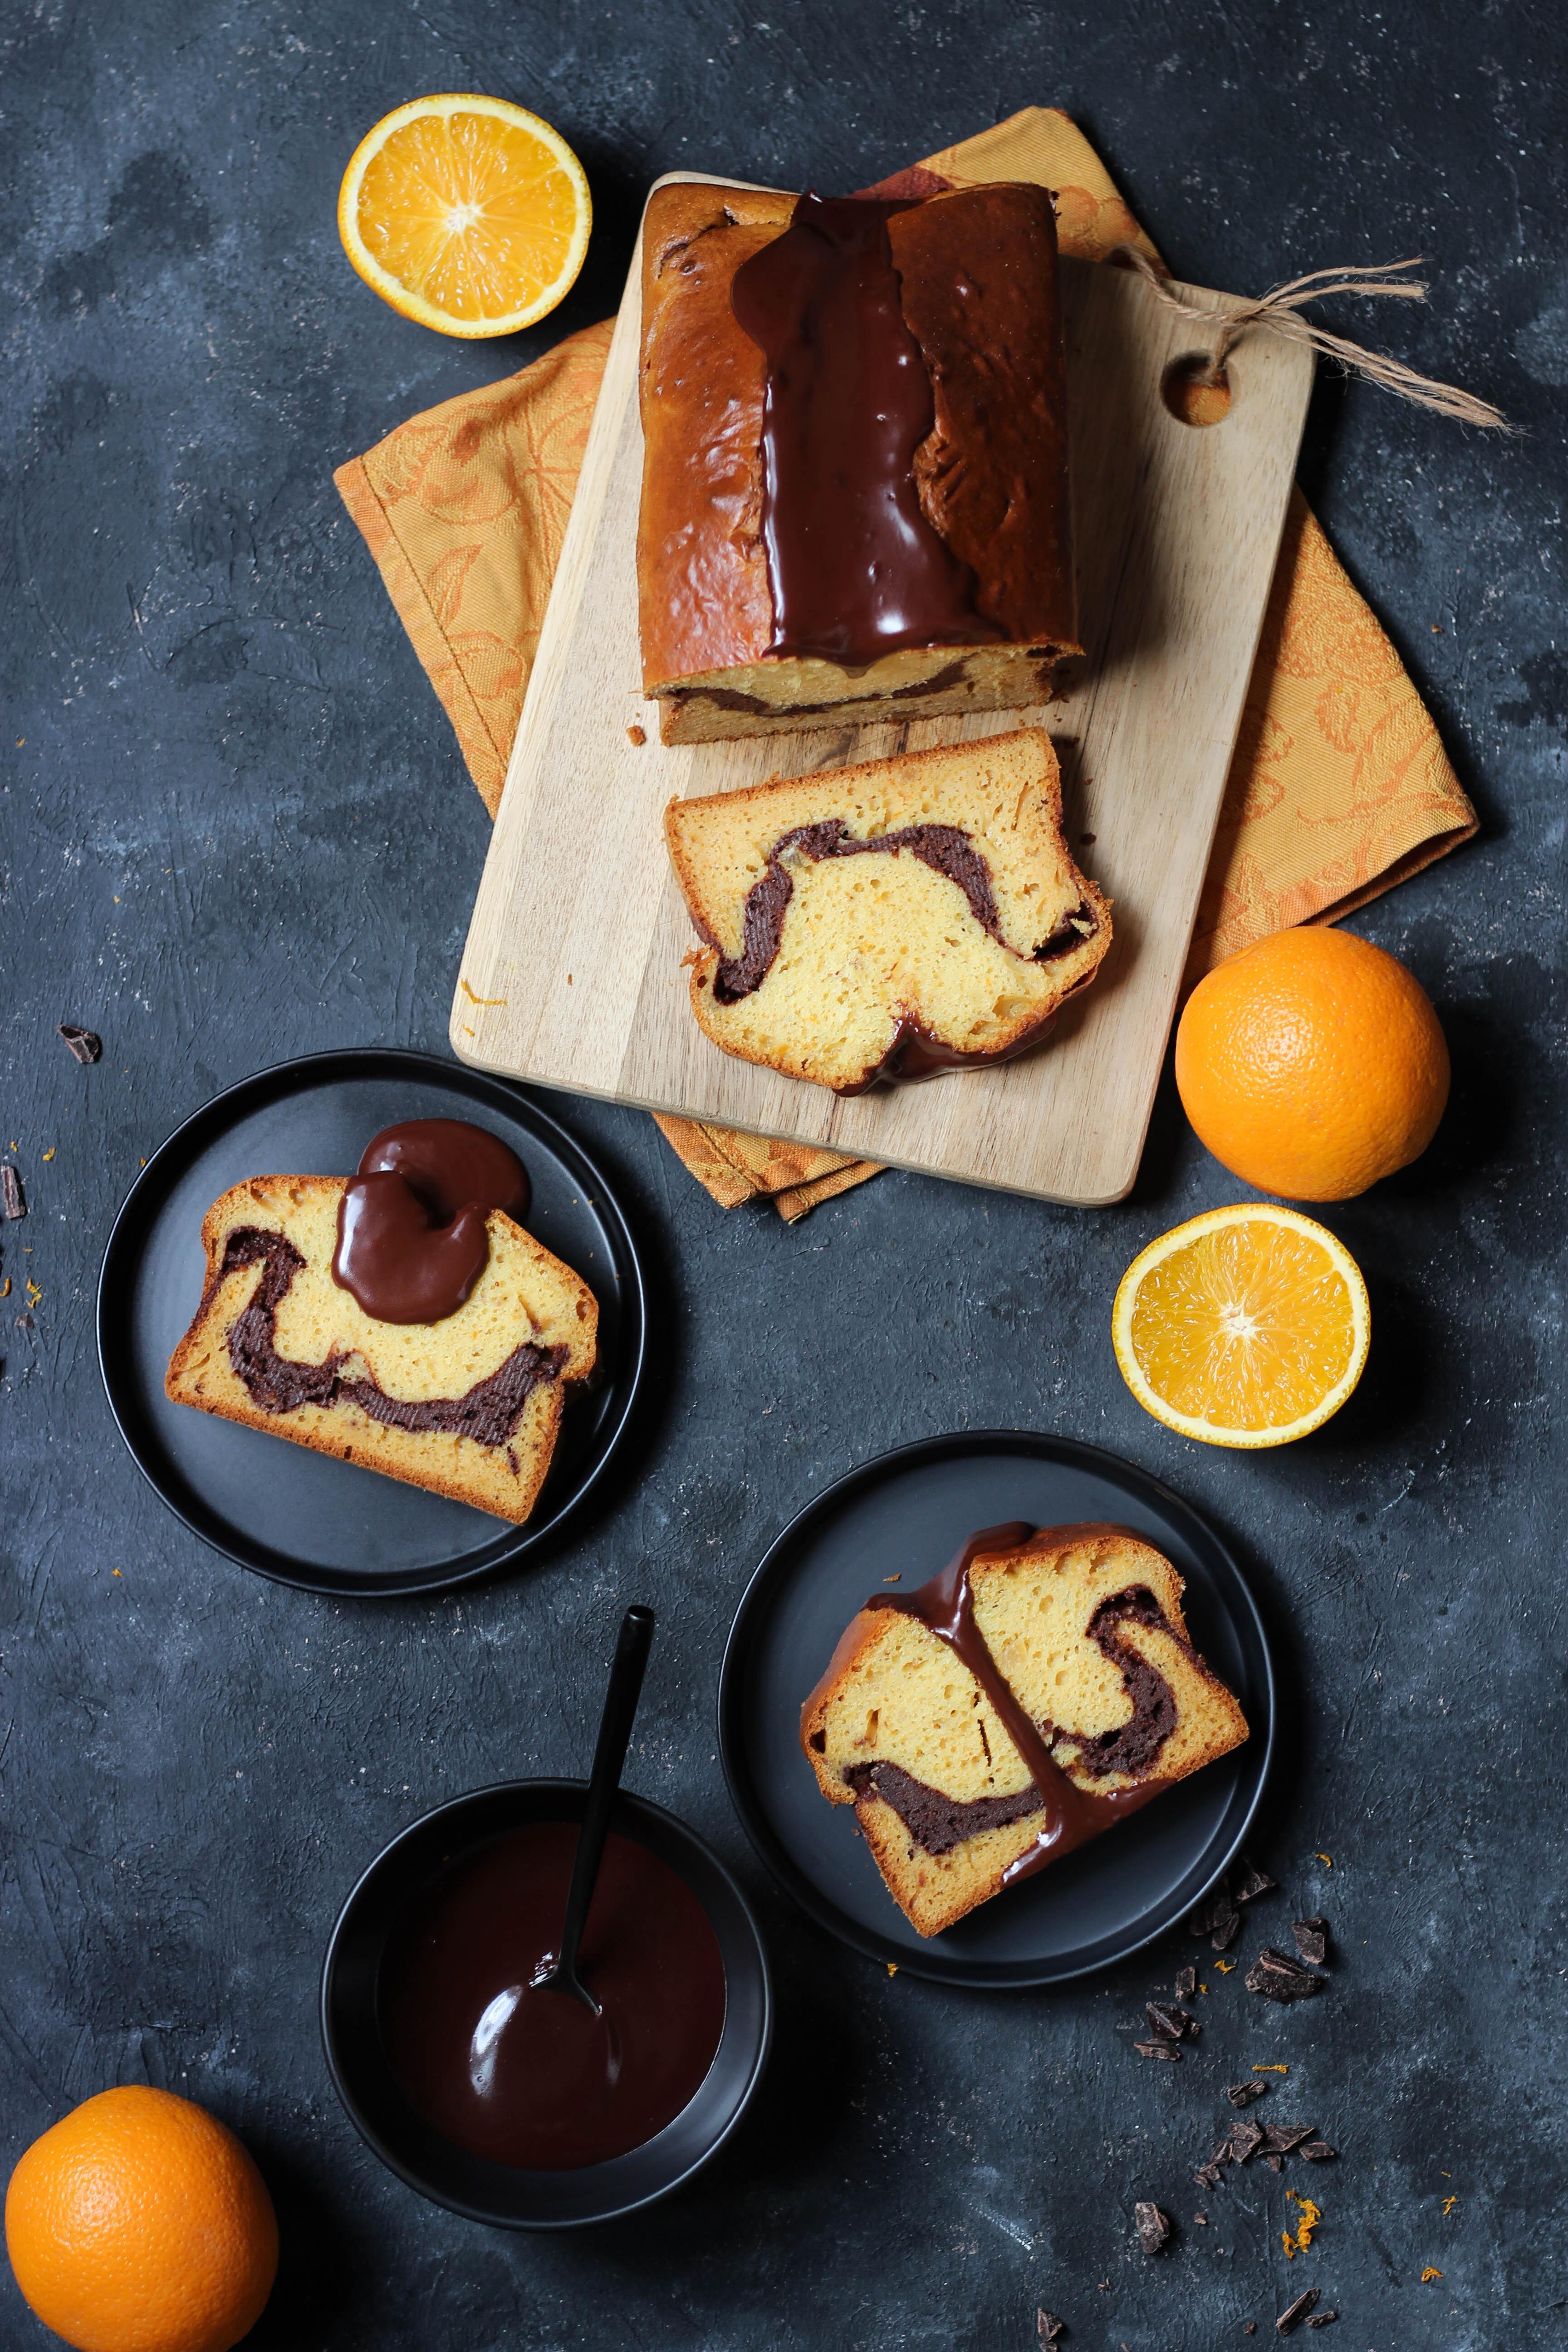 Cake à l'orange et chocolat - photography